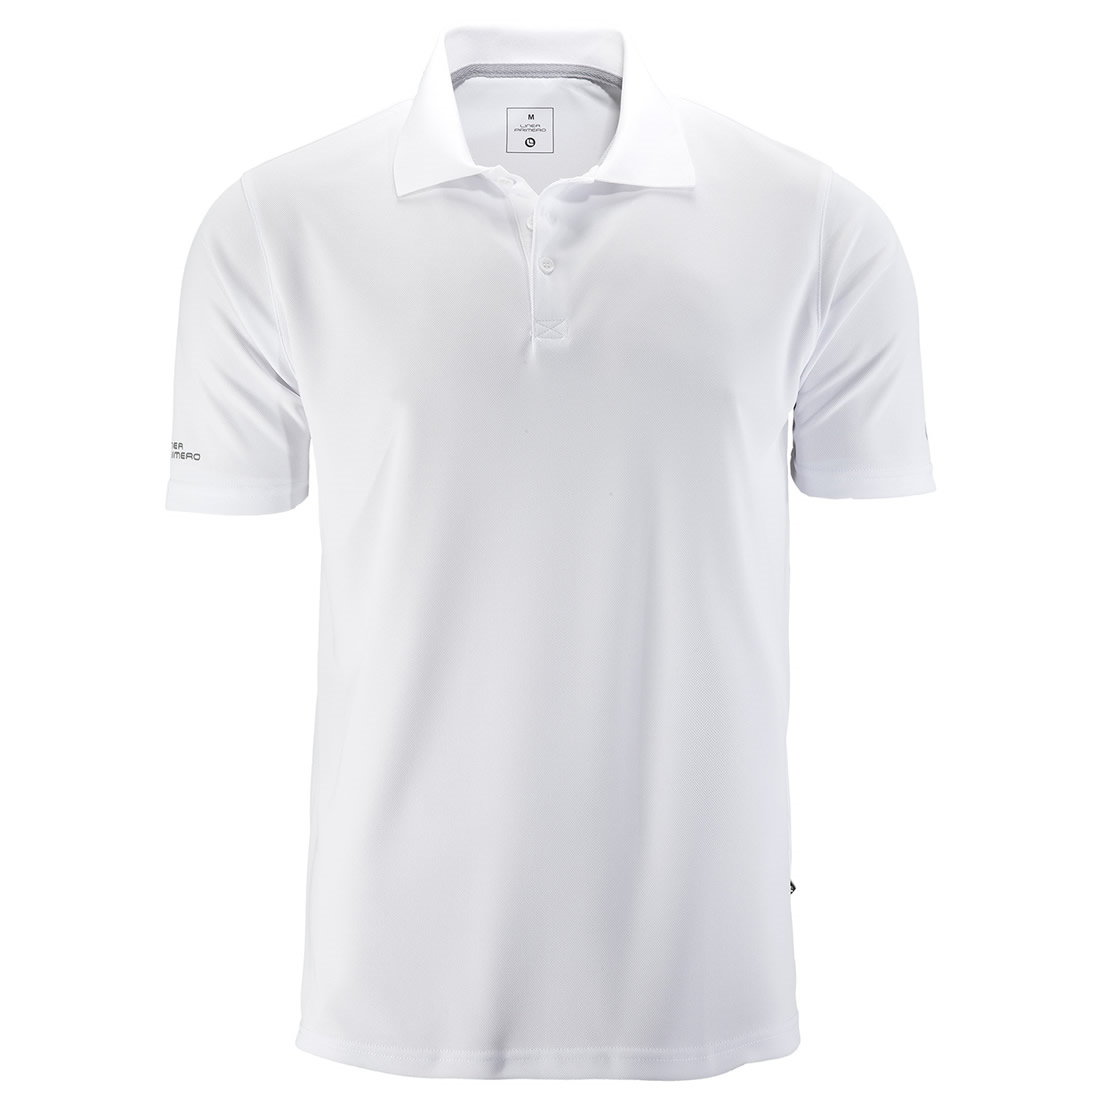 Linea Primero Aben Herren Funktions-Polo Shirt